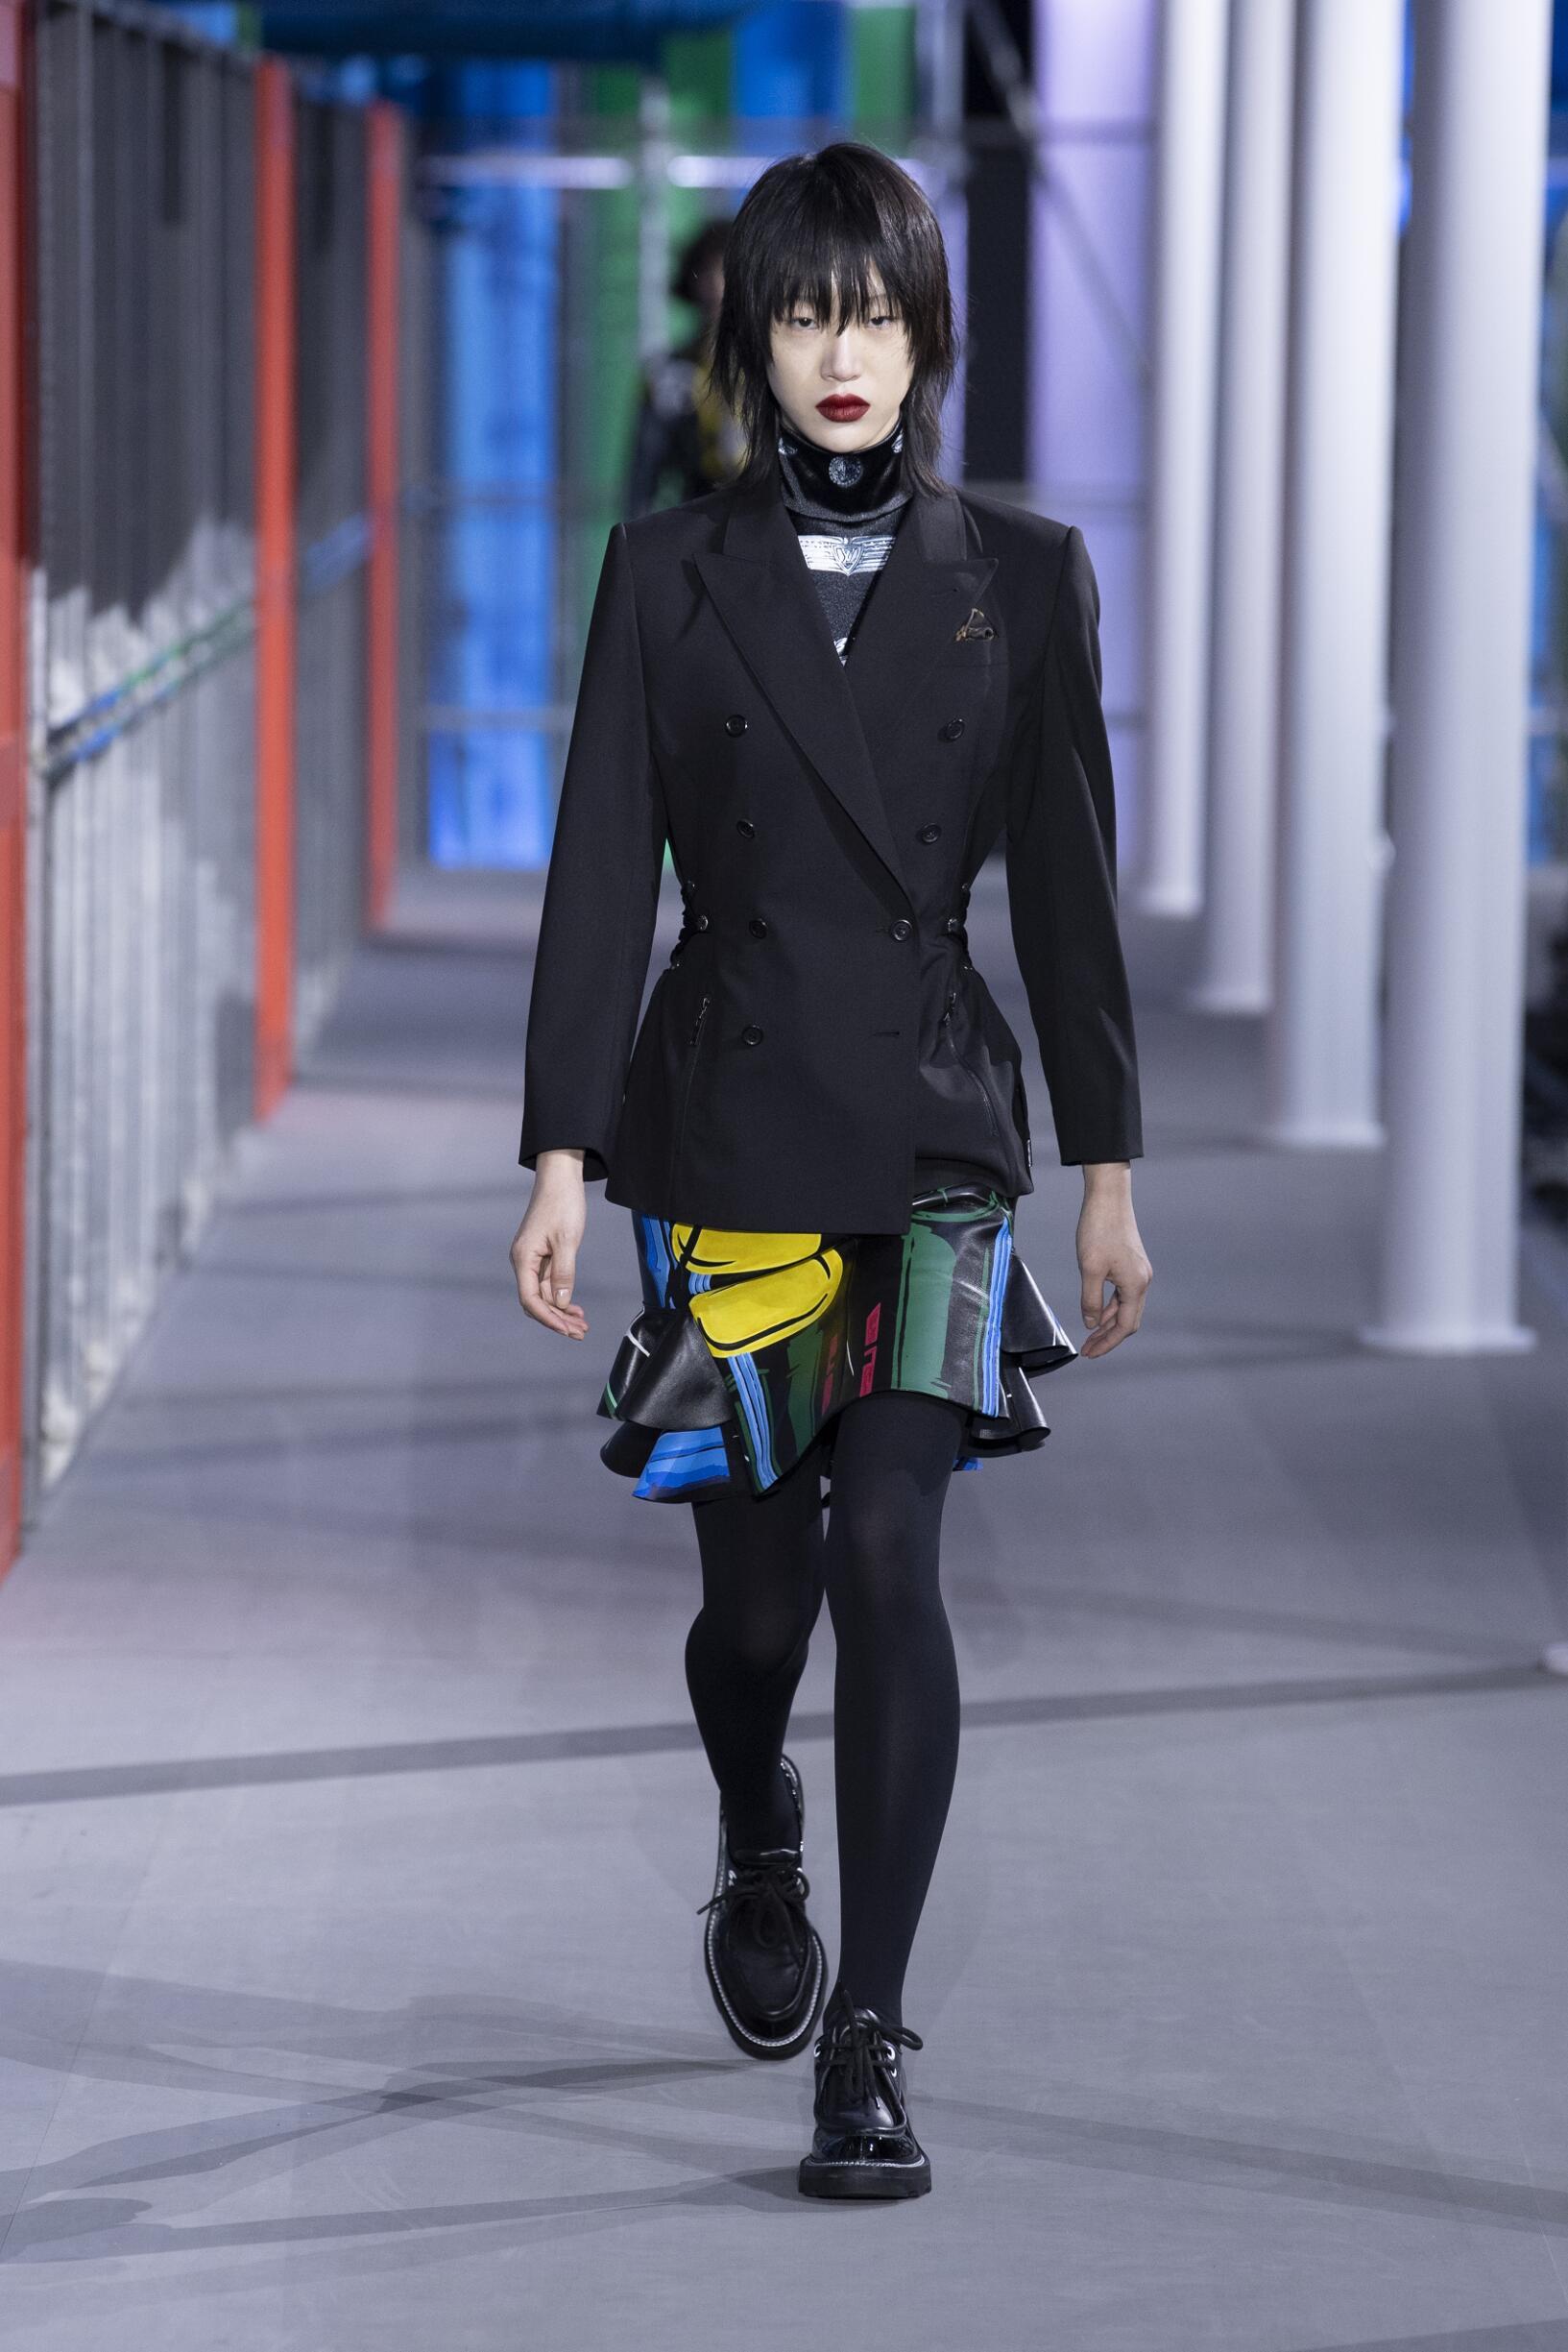 Louis Vuitton Woman Style FW 2019